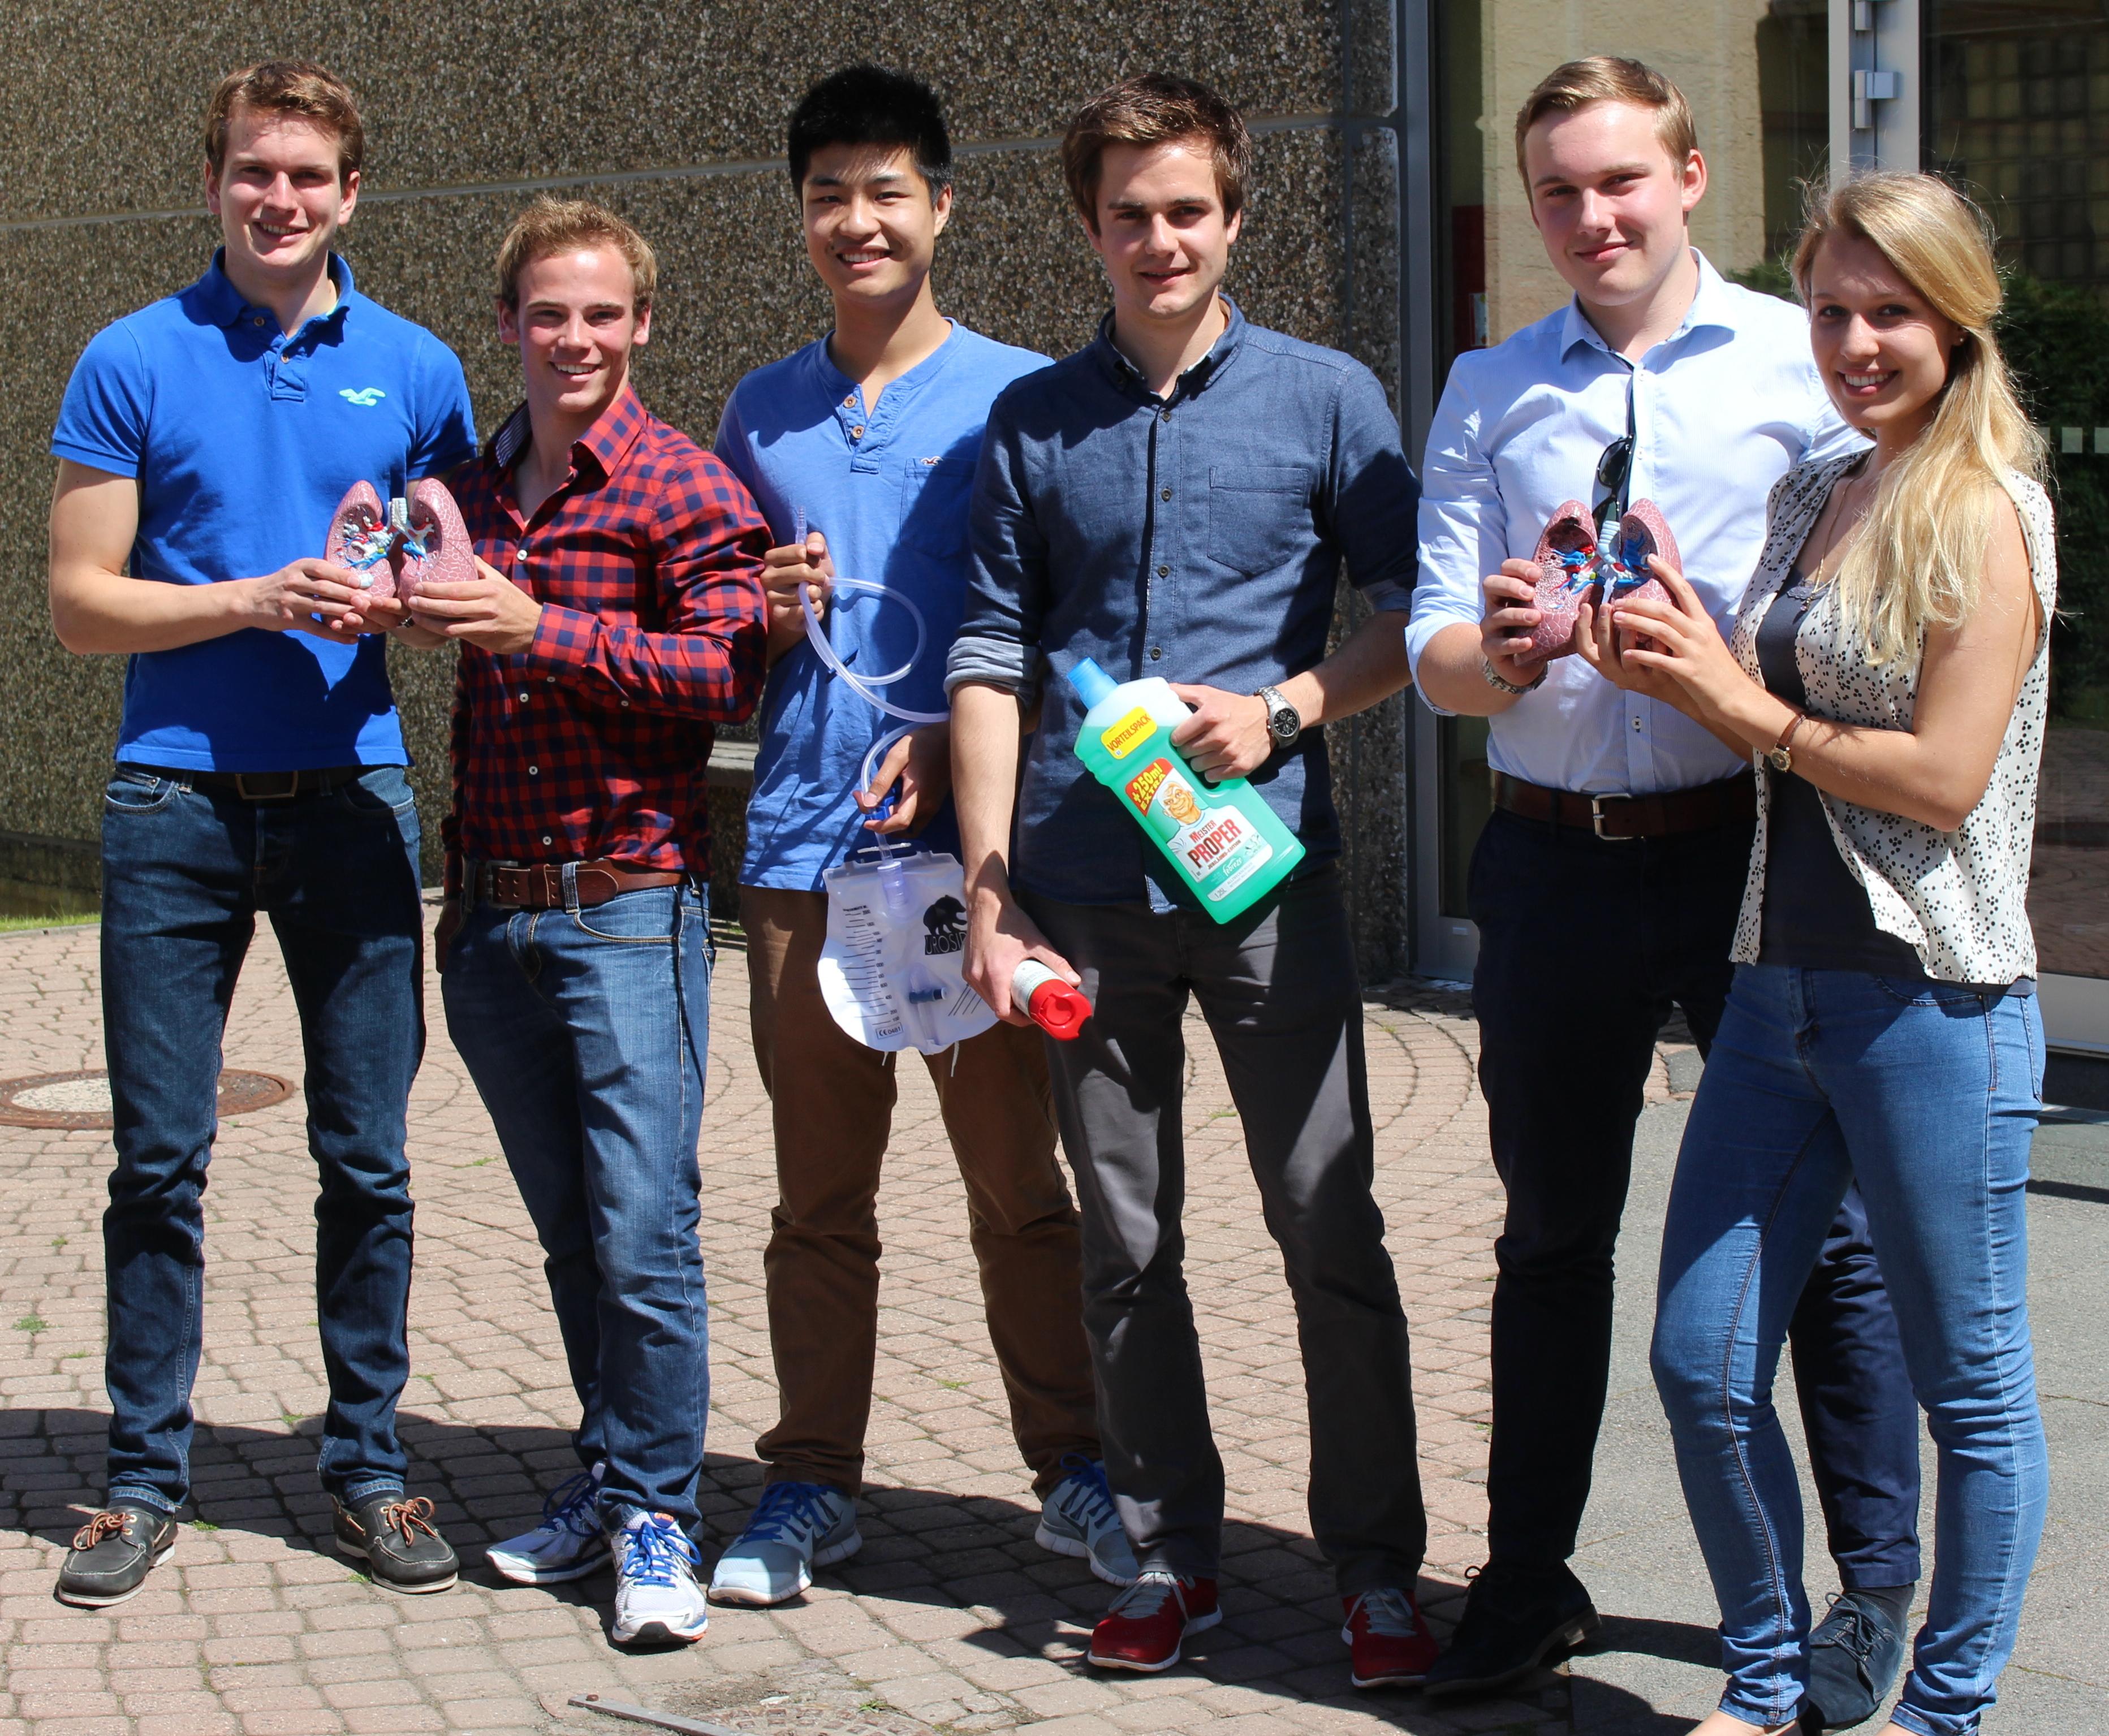 Die Giessener Medizinstudenten (v.l.) Titus Brinker, Christoph Becker, Kevin Lo, Hannes Tabert, Felix Hofmann und Laura Schwab.JPG